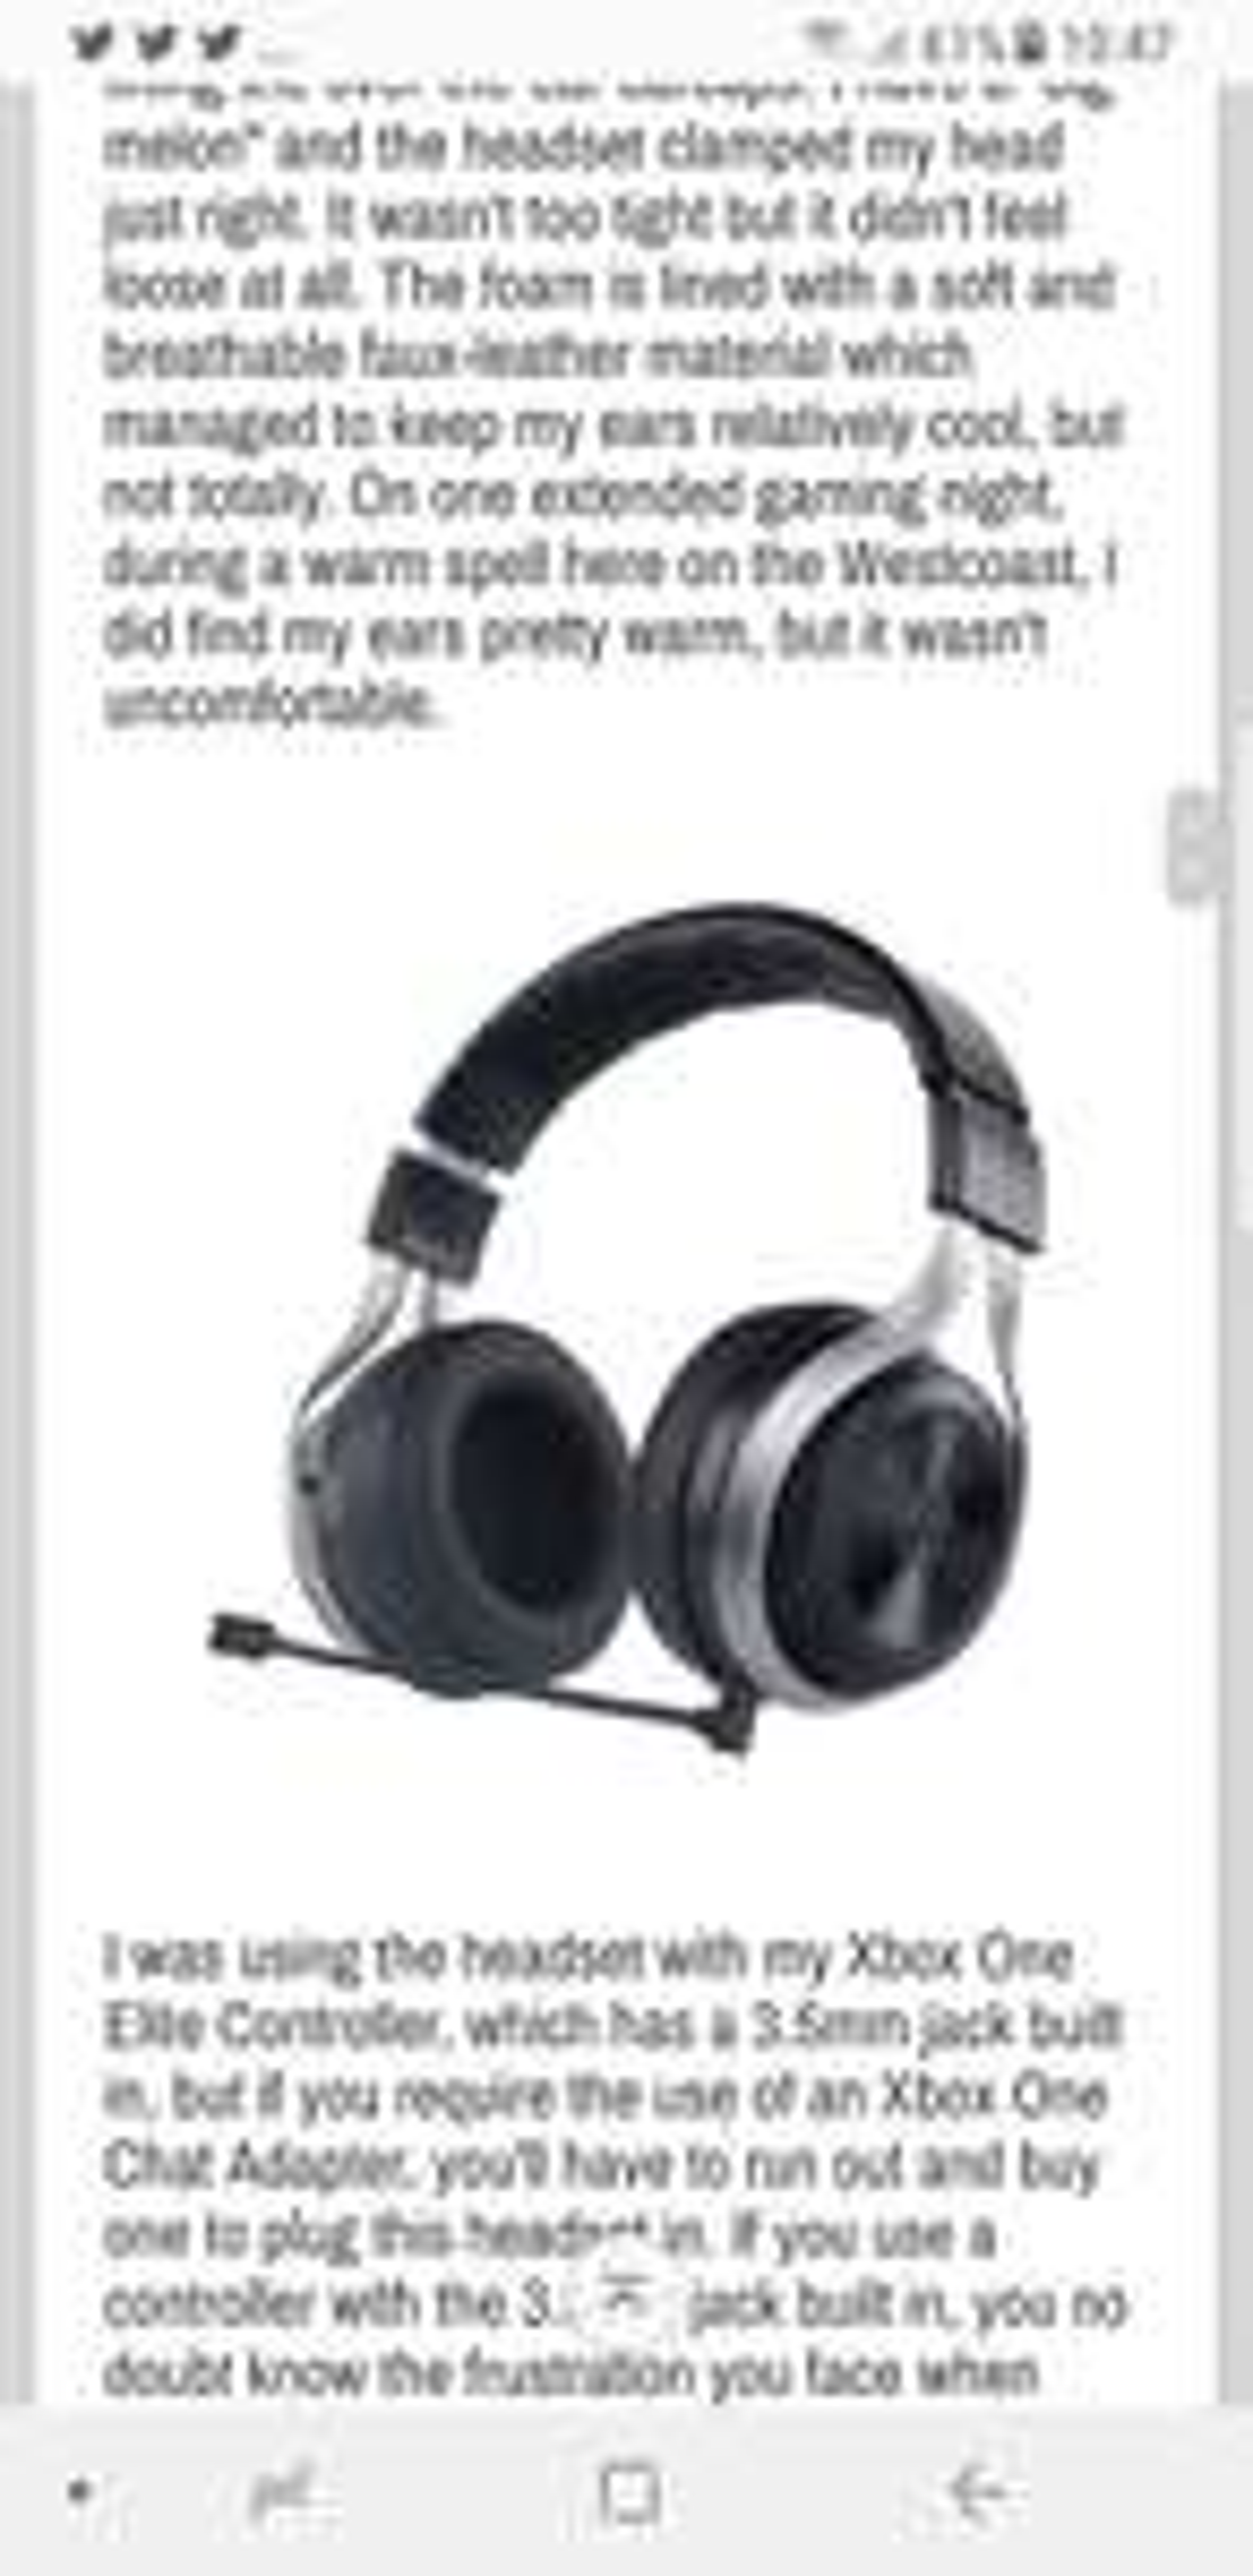 LucidSound LS30 Wireless Gaming Headset - Black (PS4/Xbox One/Xbox/PS3) £62.99 Argos on eBay